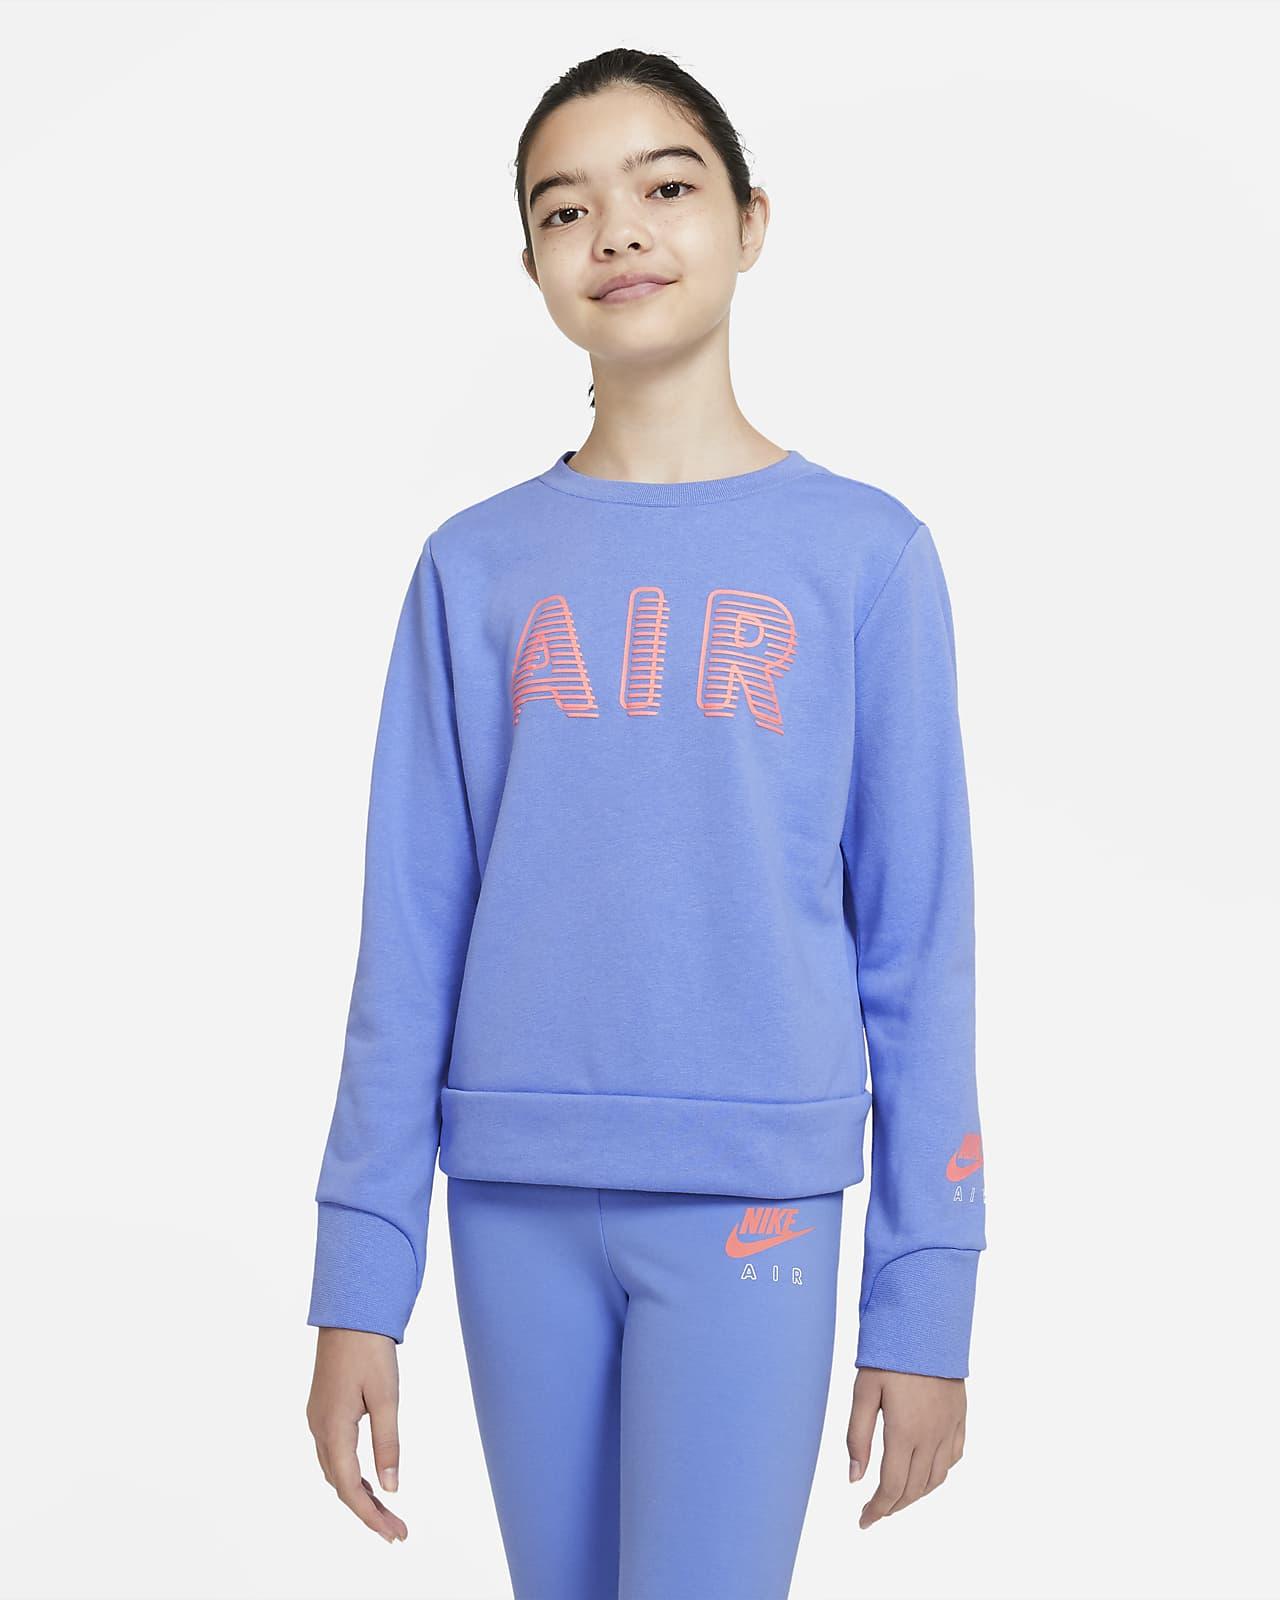 Nike Air 大童(女孩)圆领上衣